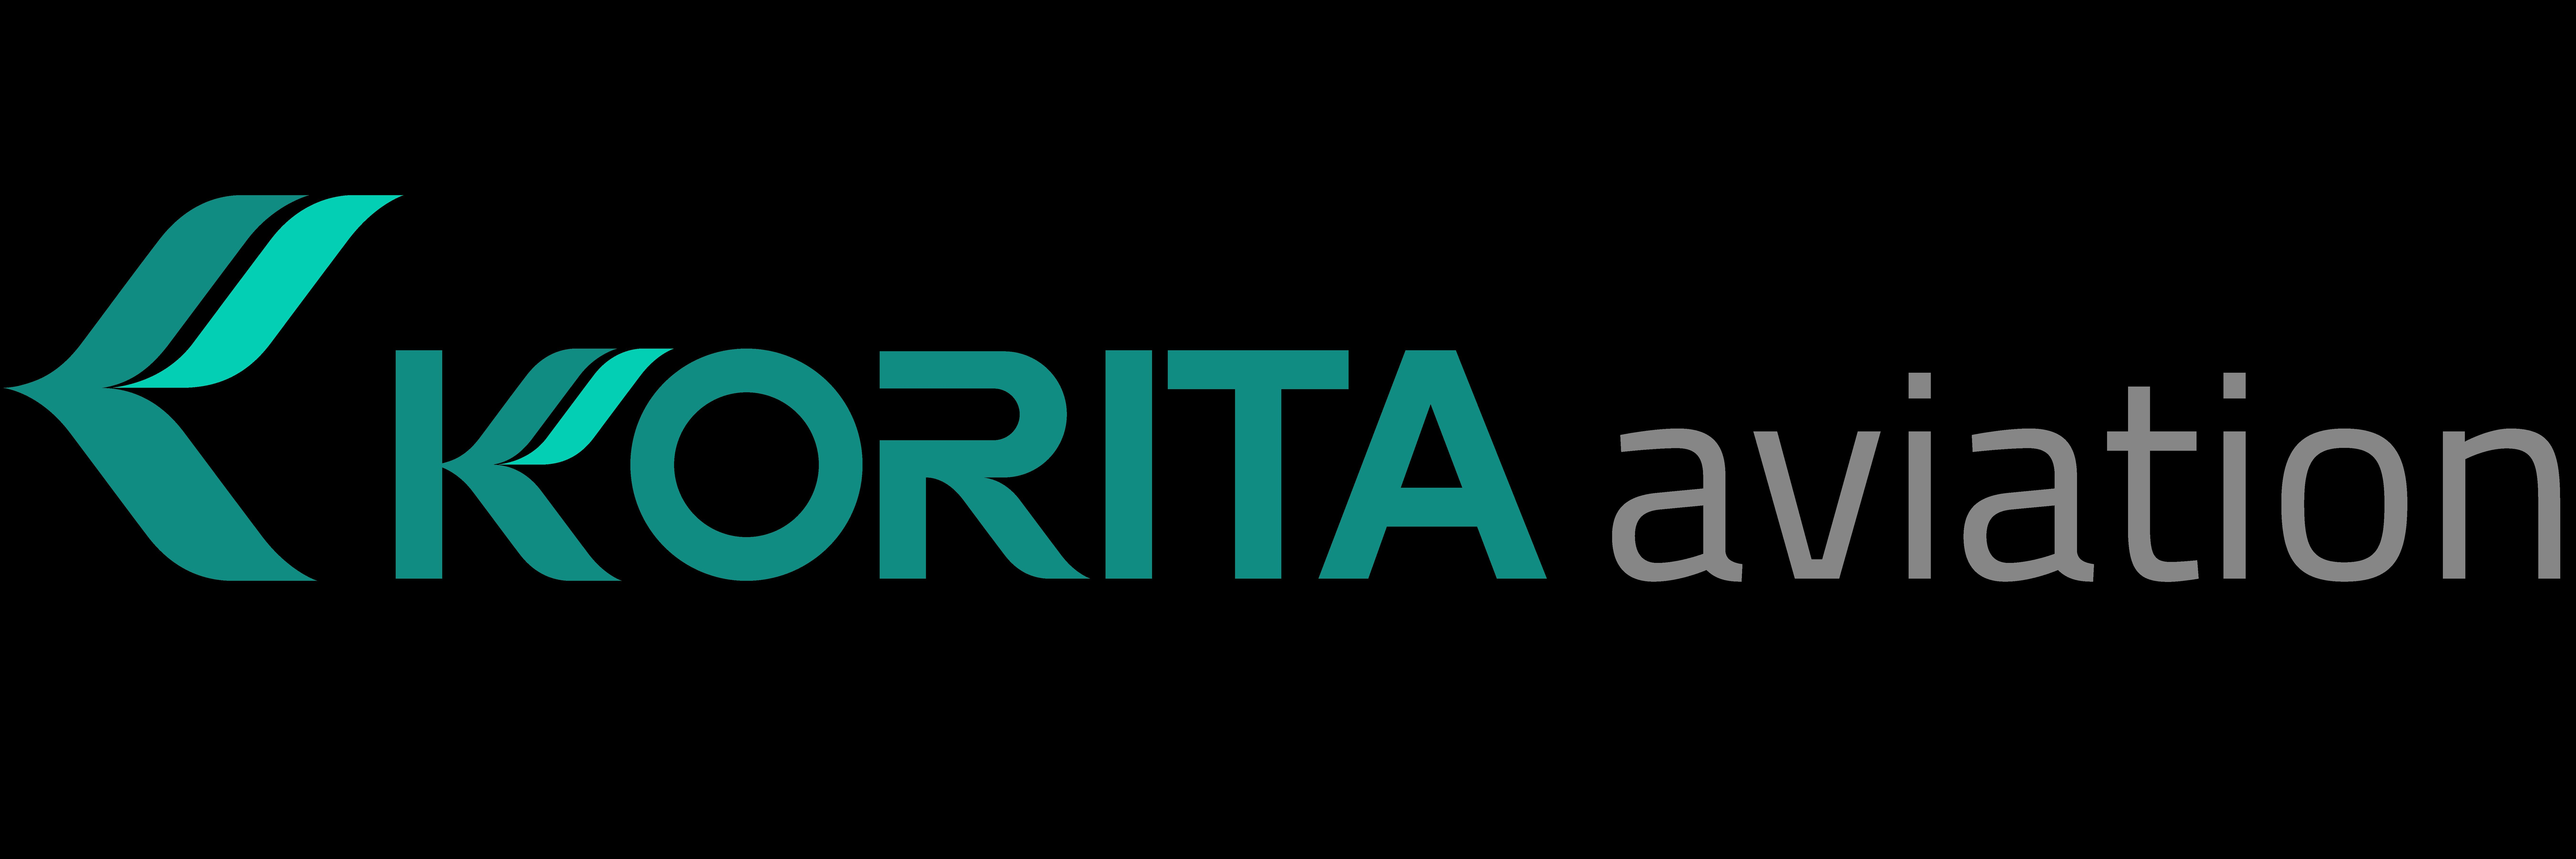 Korita Aviation